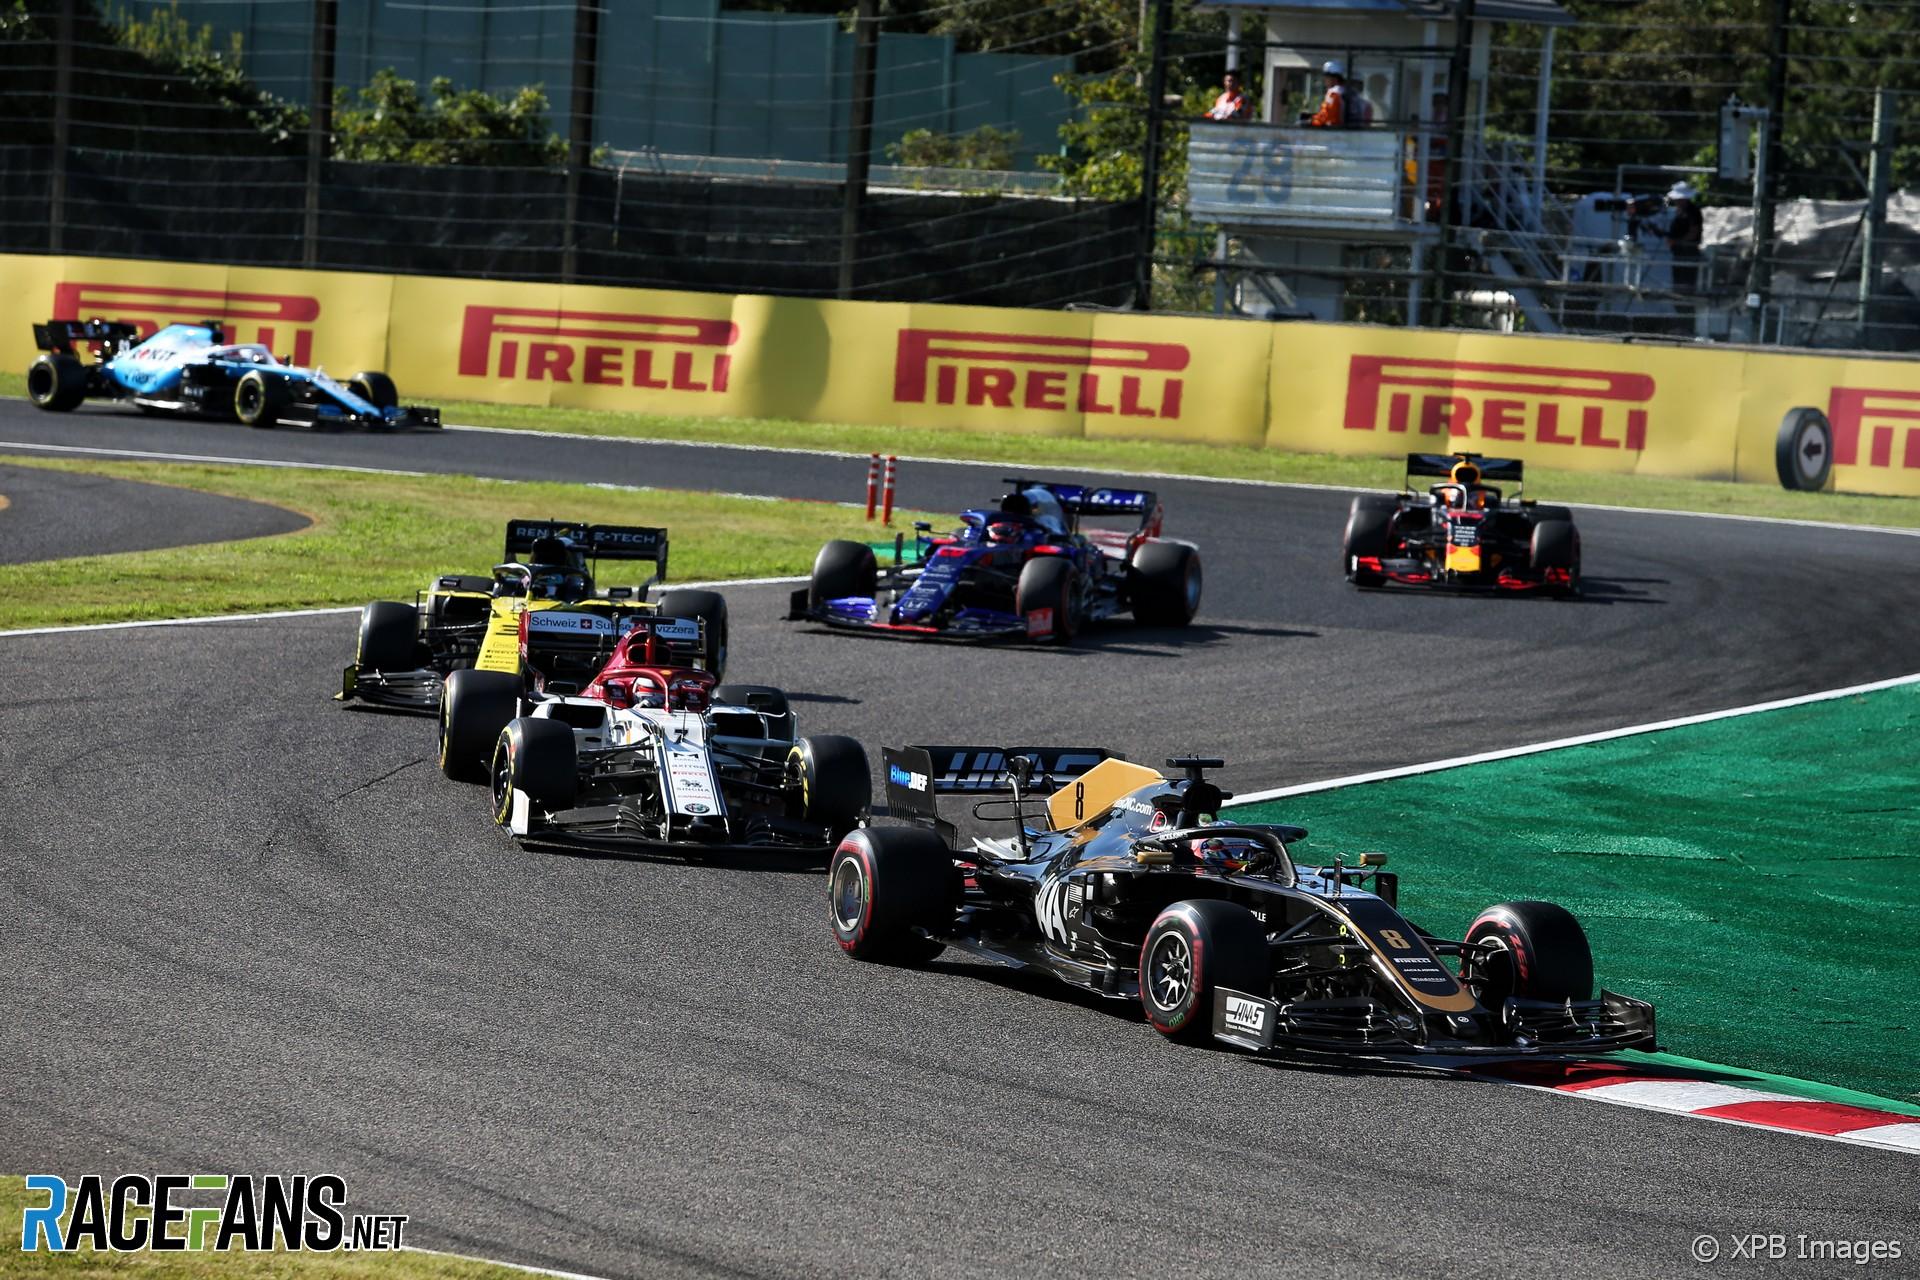 Romain Grosjean, Haas, Suzuka, 2019